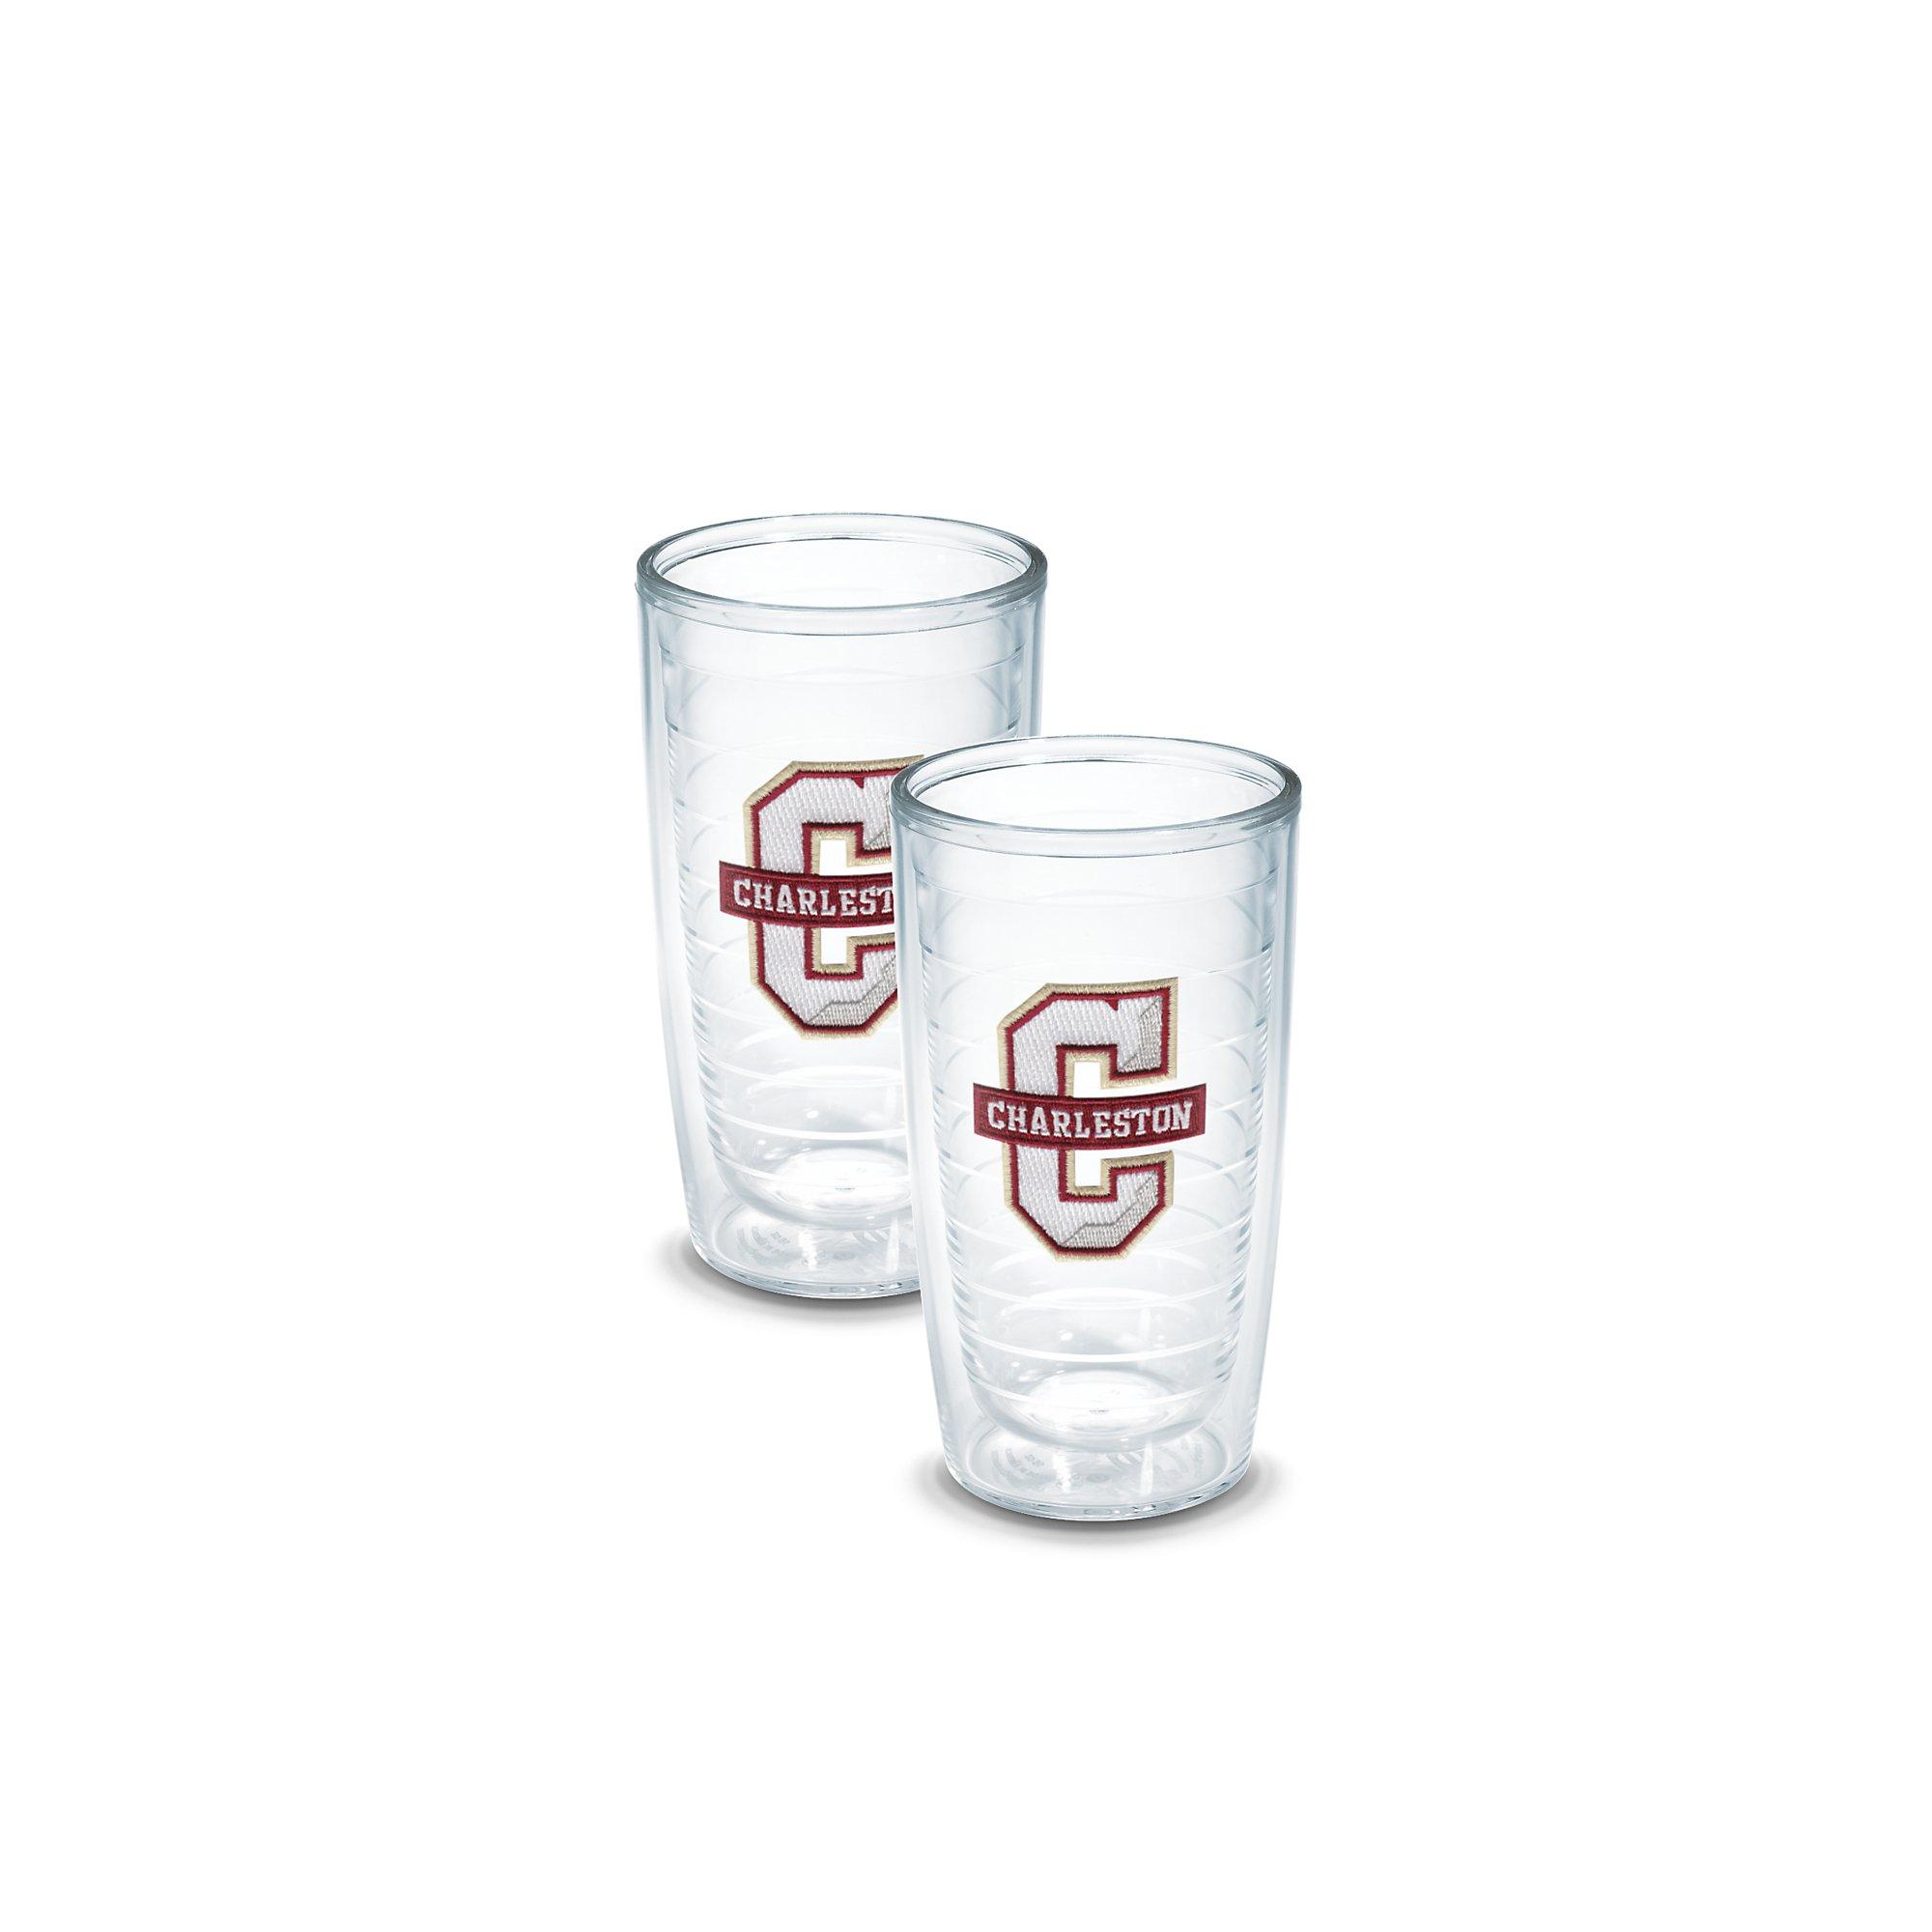 Tervis 1133369 Charleston College Emblem Tumbler, Set of 2, 16 oz, Clear